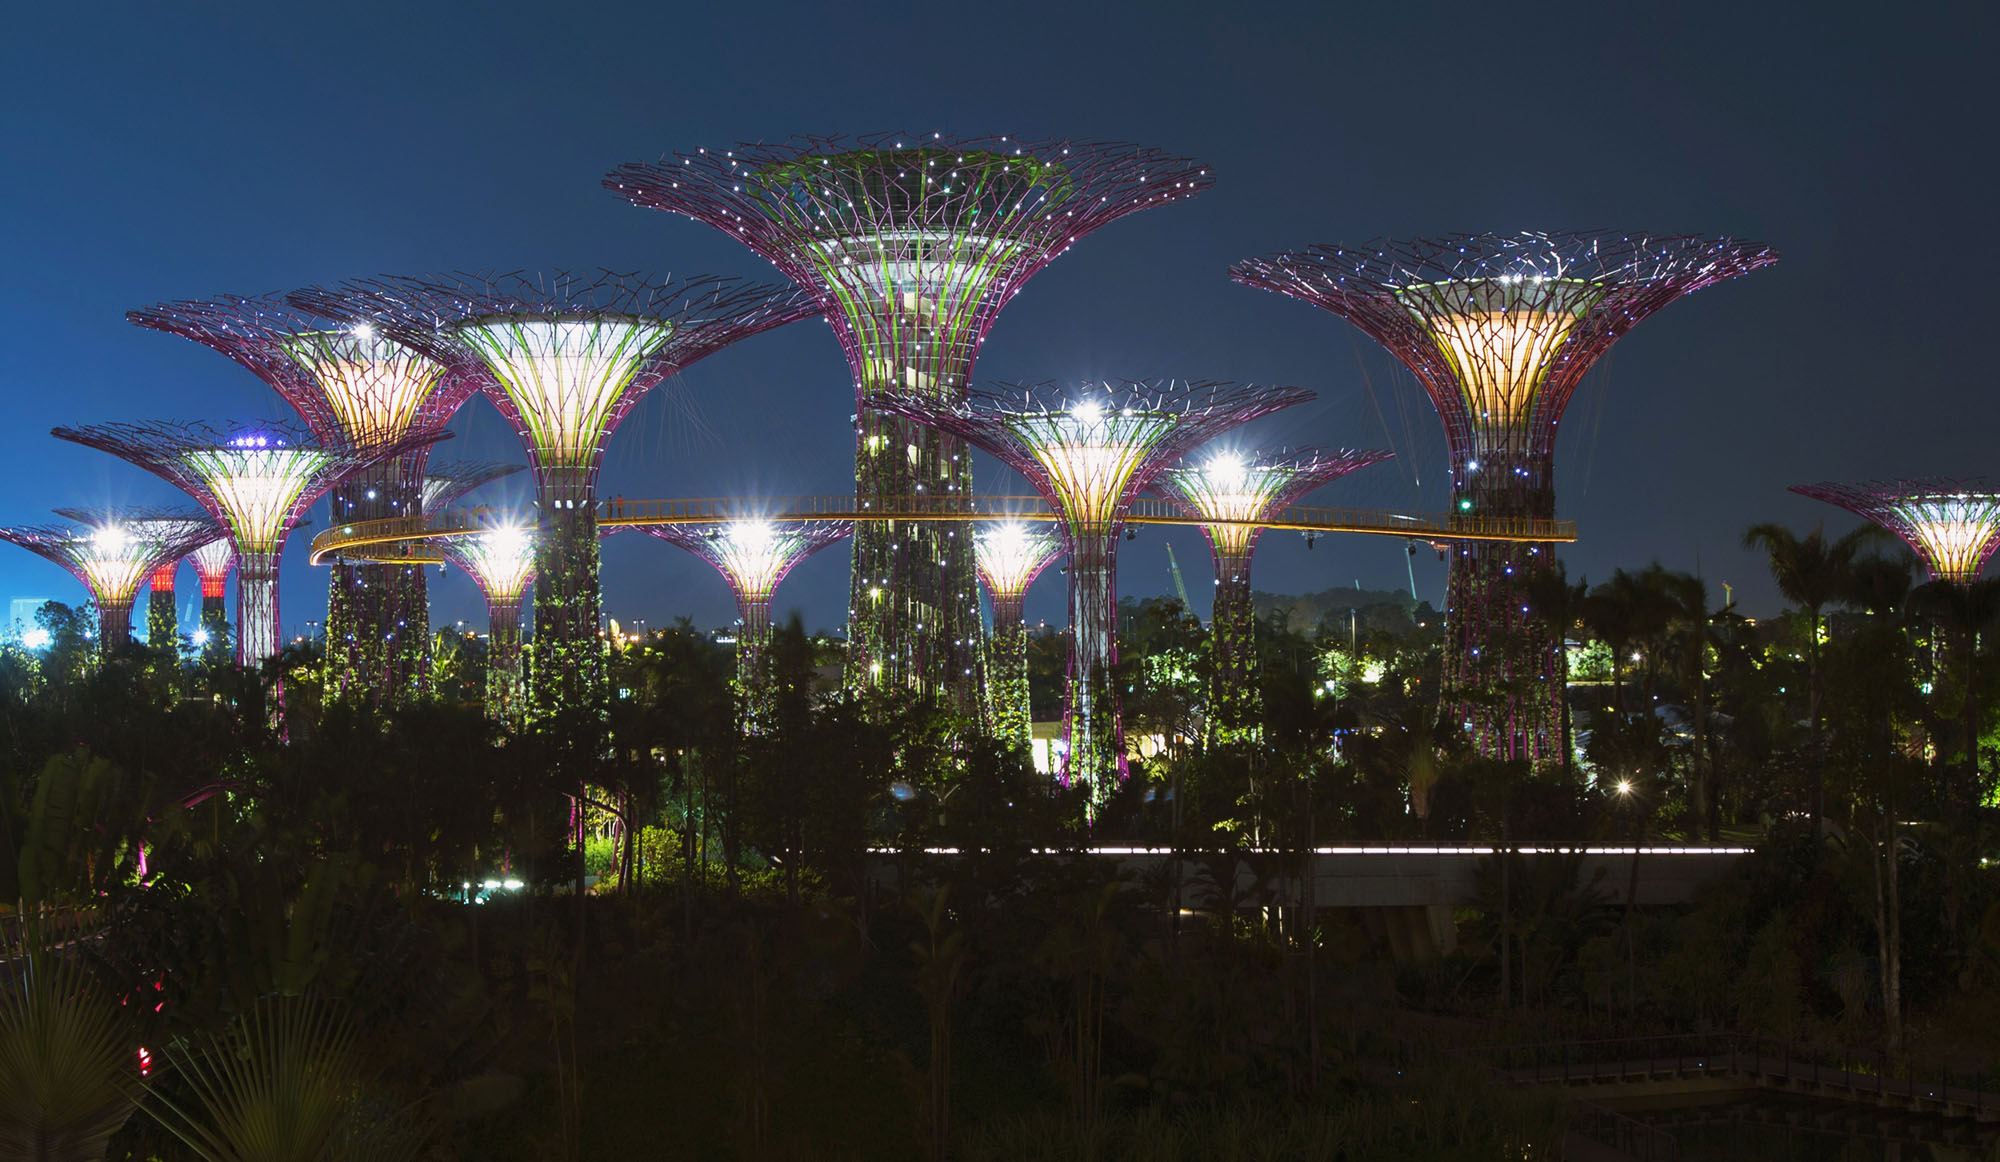 Le jardin extraordinaire de singapour for Jardin extraordinaire